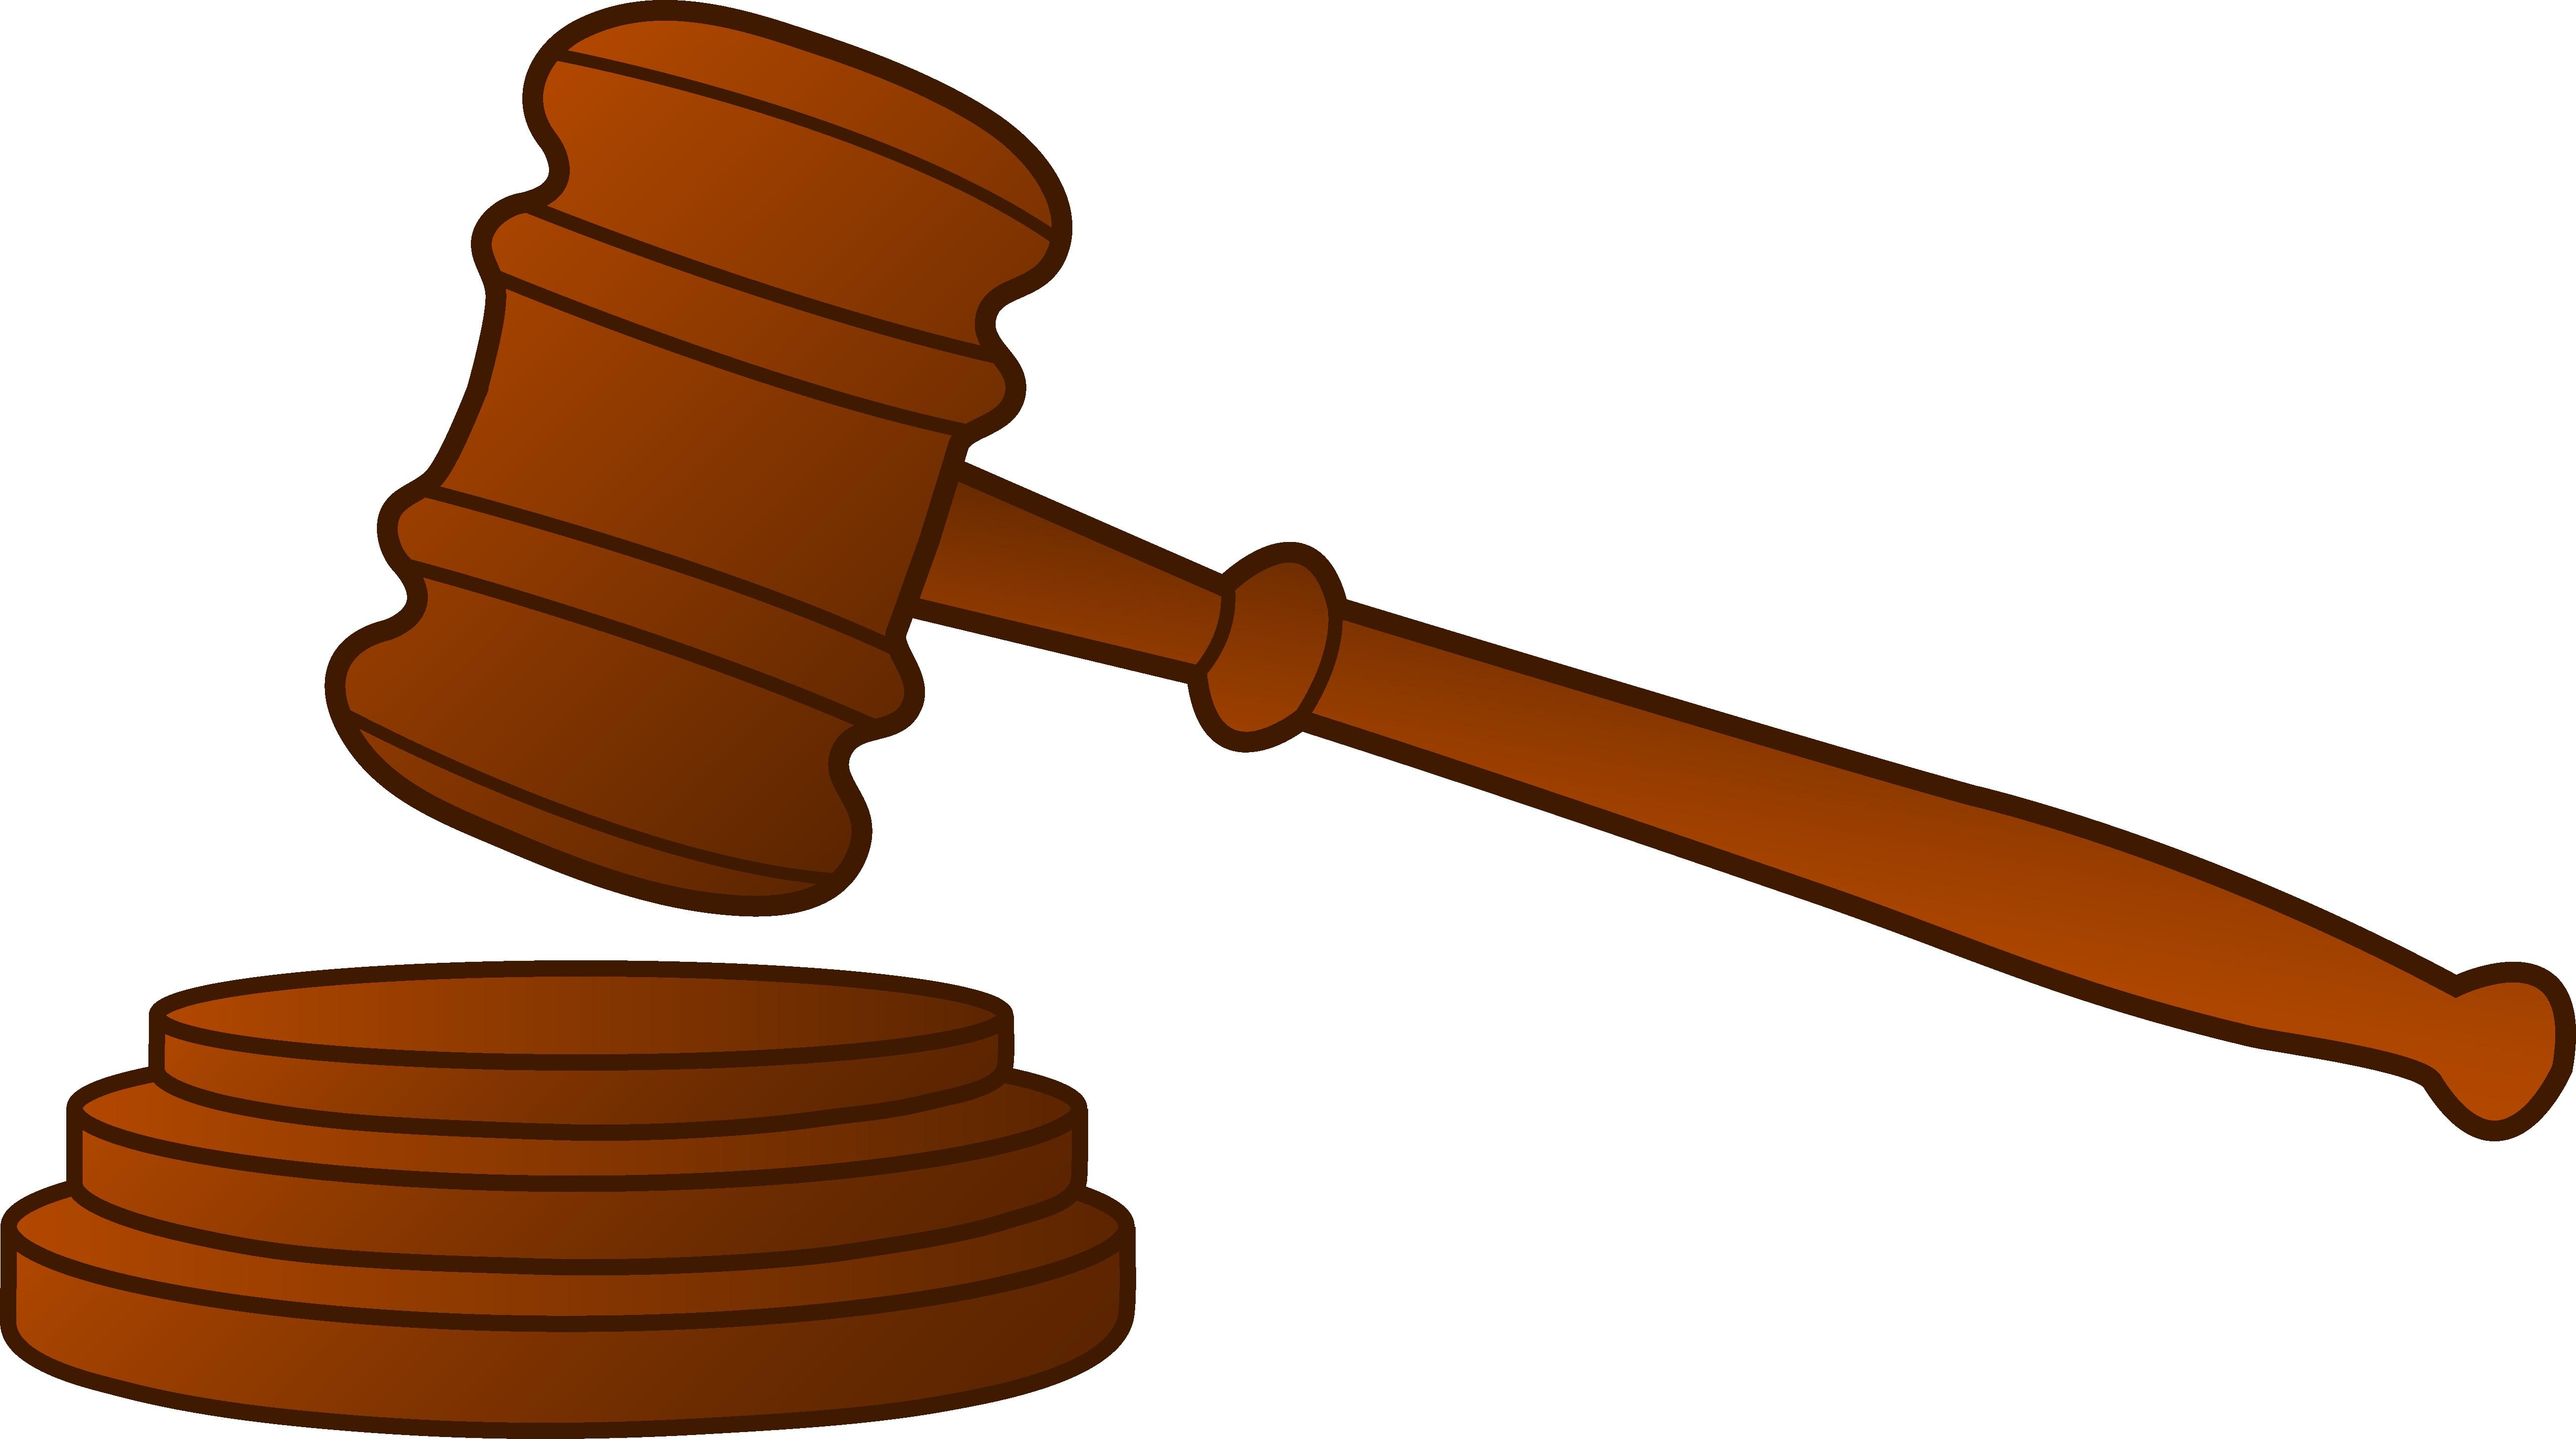 Court clipart constitutionalism. Planned parenthood sues ohio